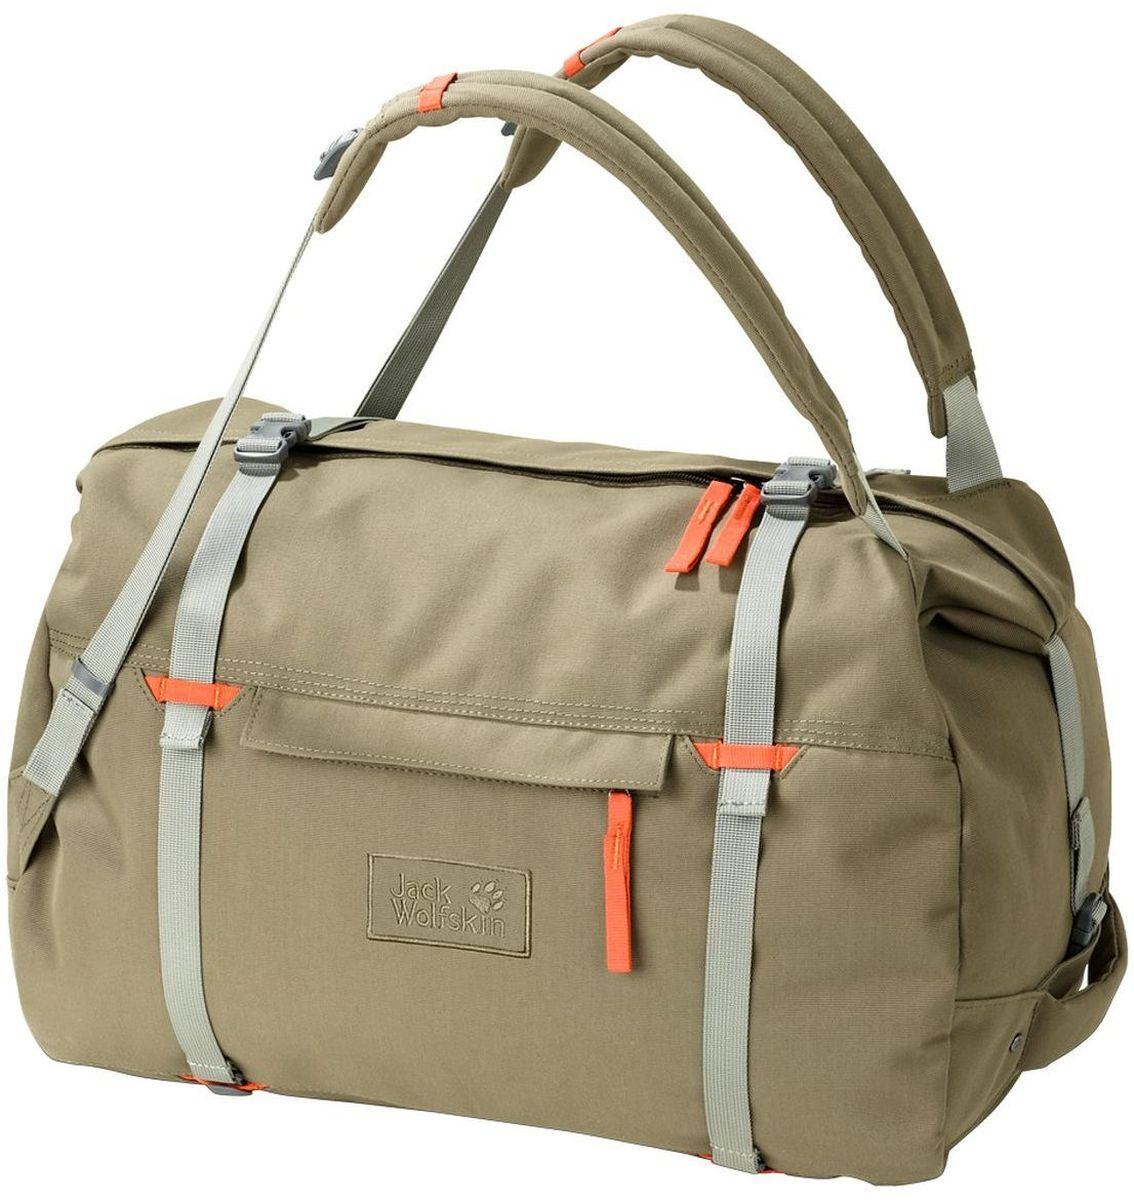 Сумка-рюкзак Jack Wolfskin Roamer 80 Duffle, цвет: хаки, оранжевый. 2005451-5033